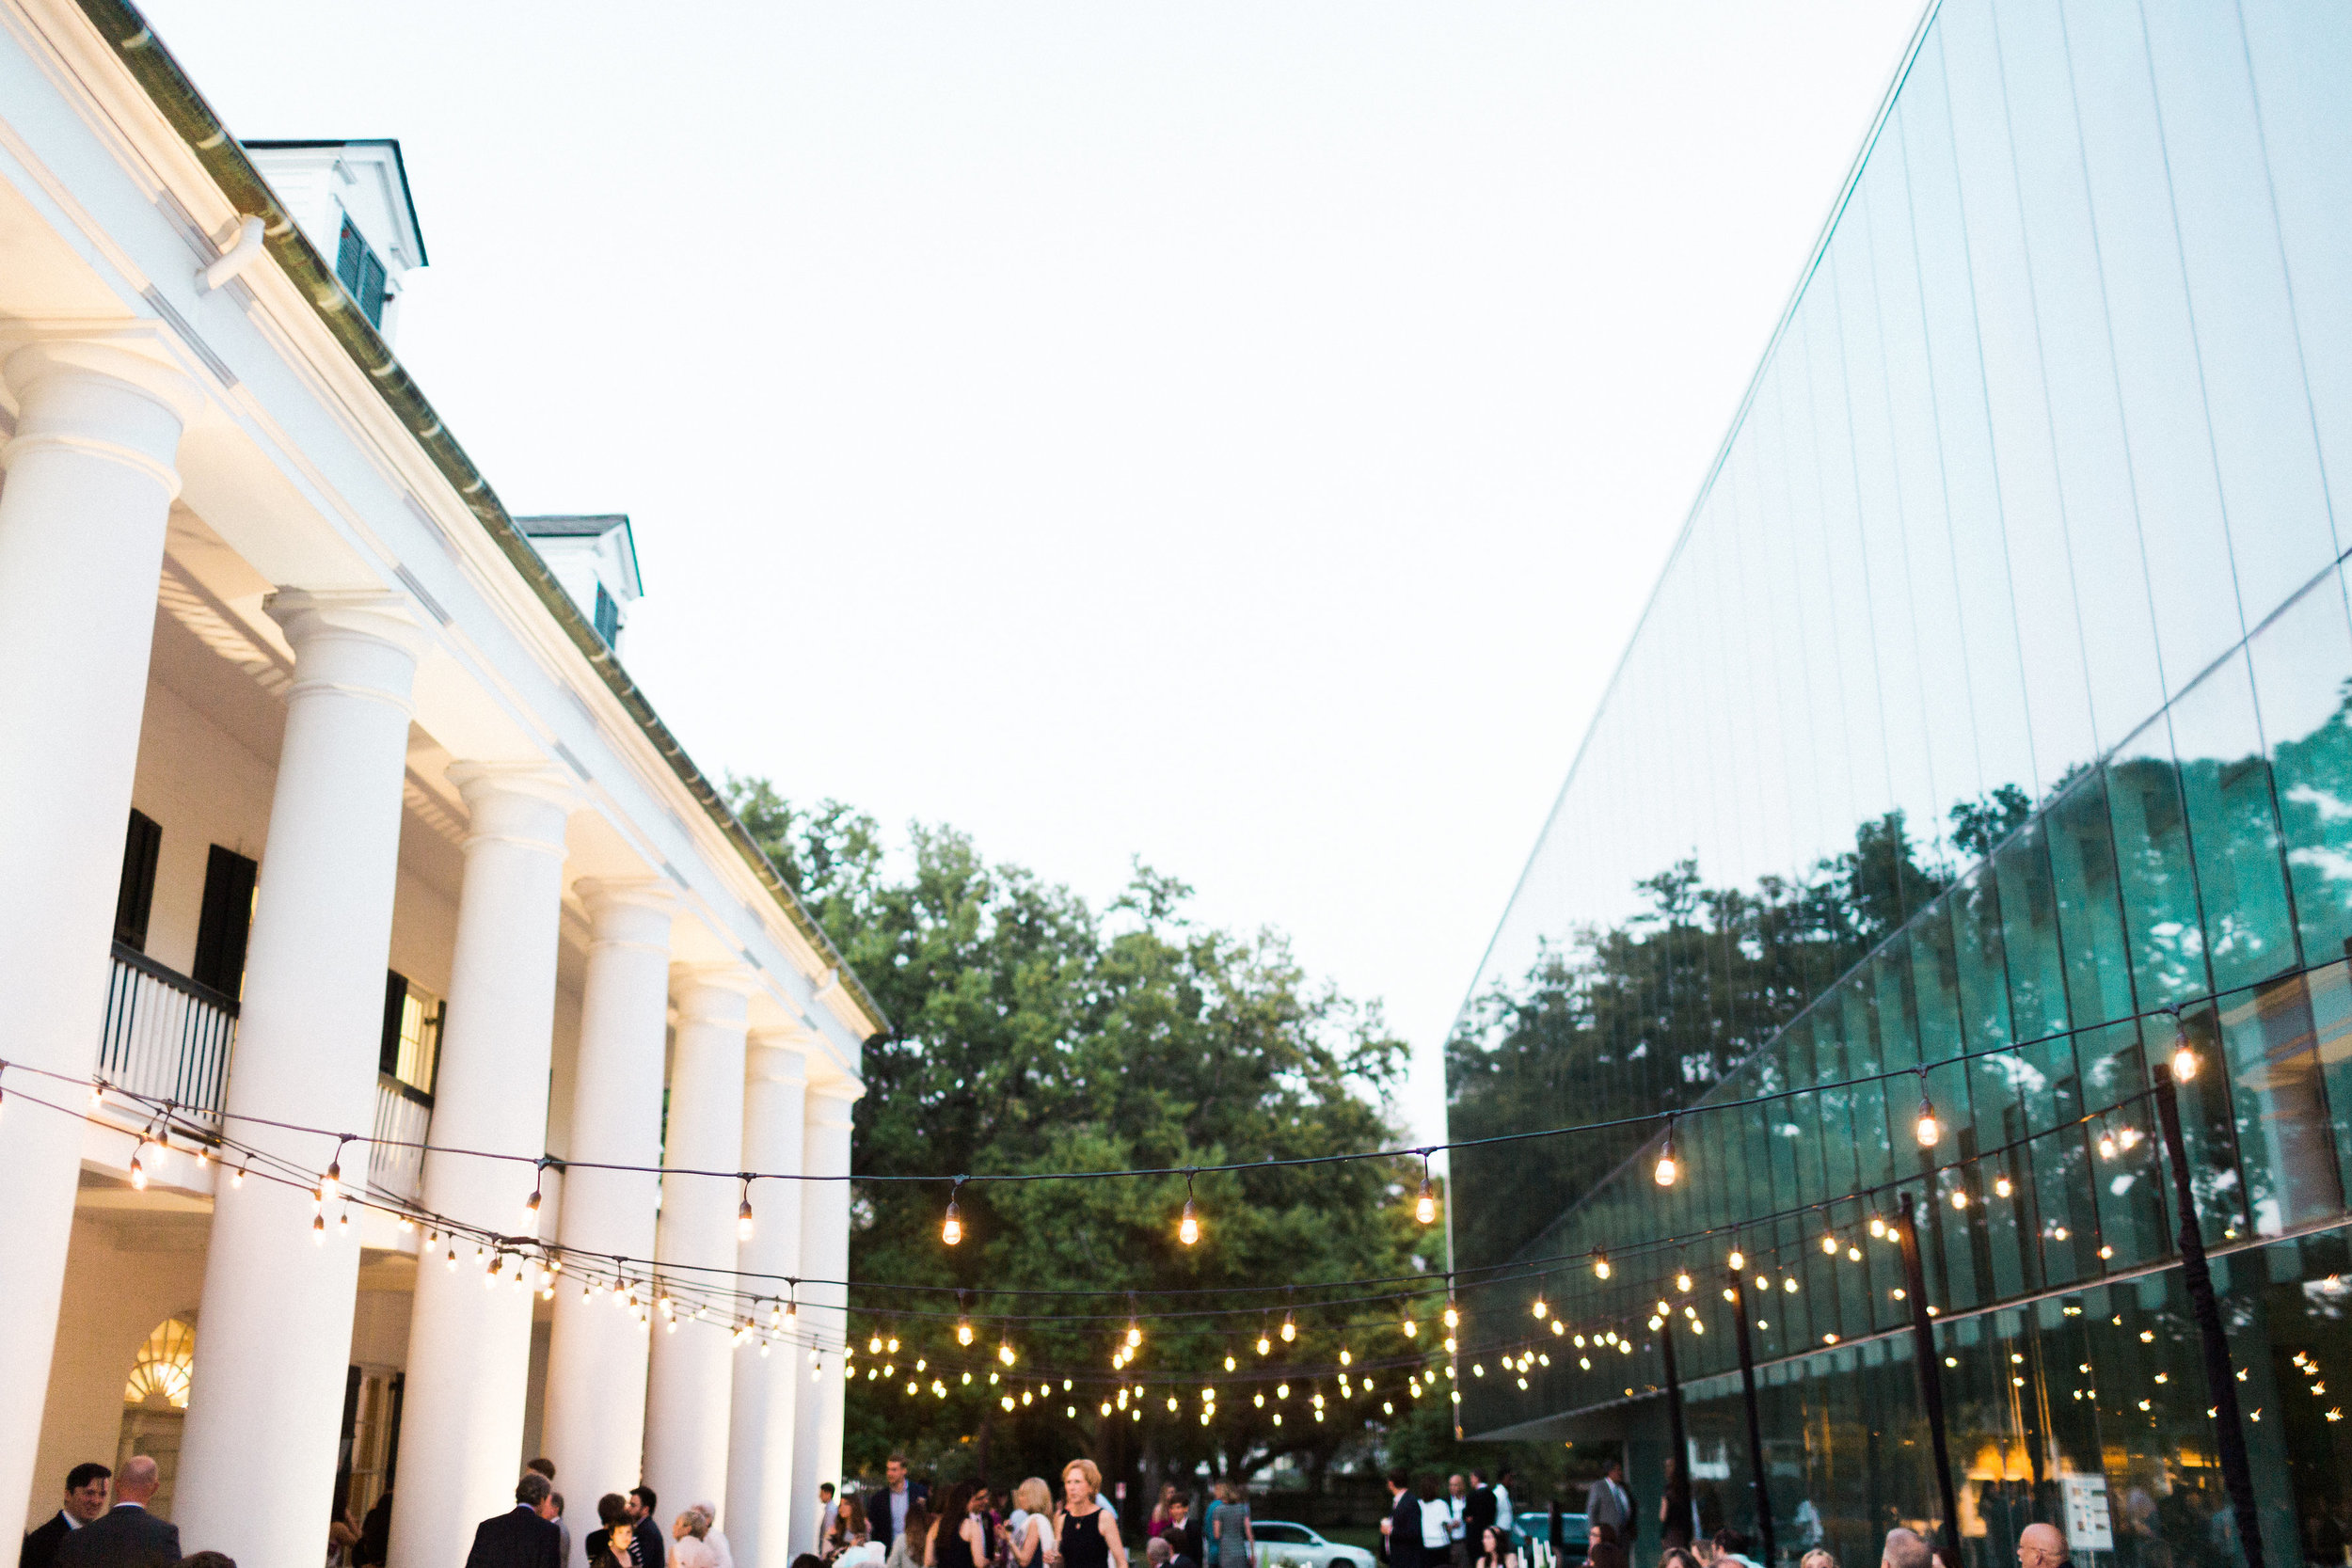 Southern Fete, Southern Wedding, Paul and Lulu Hilliard Art Museum, Outside Lights